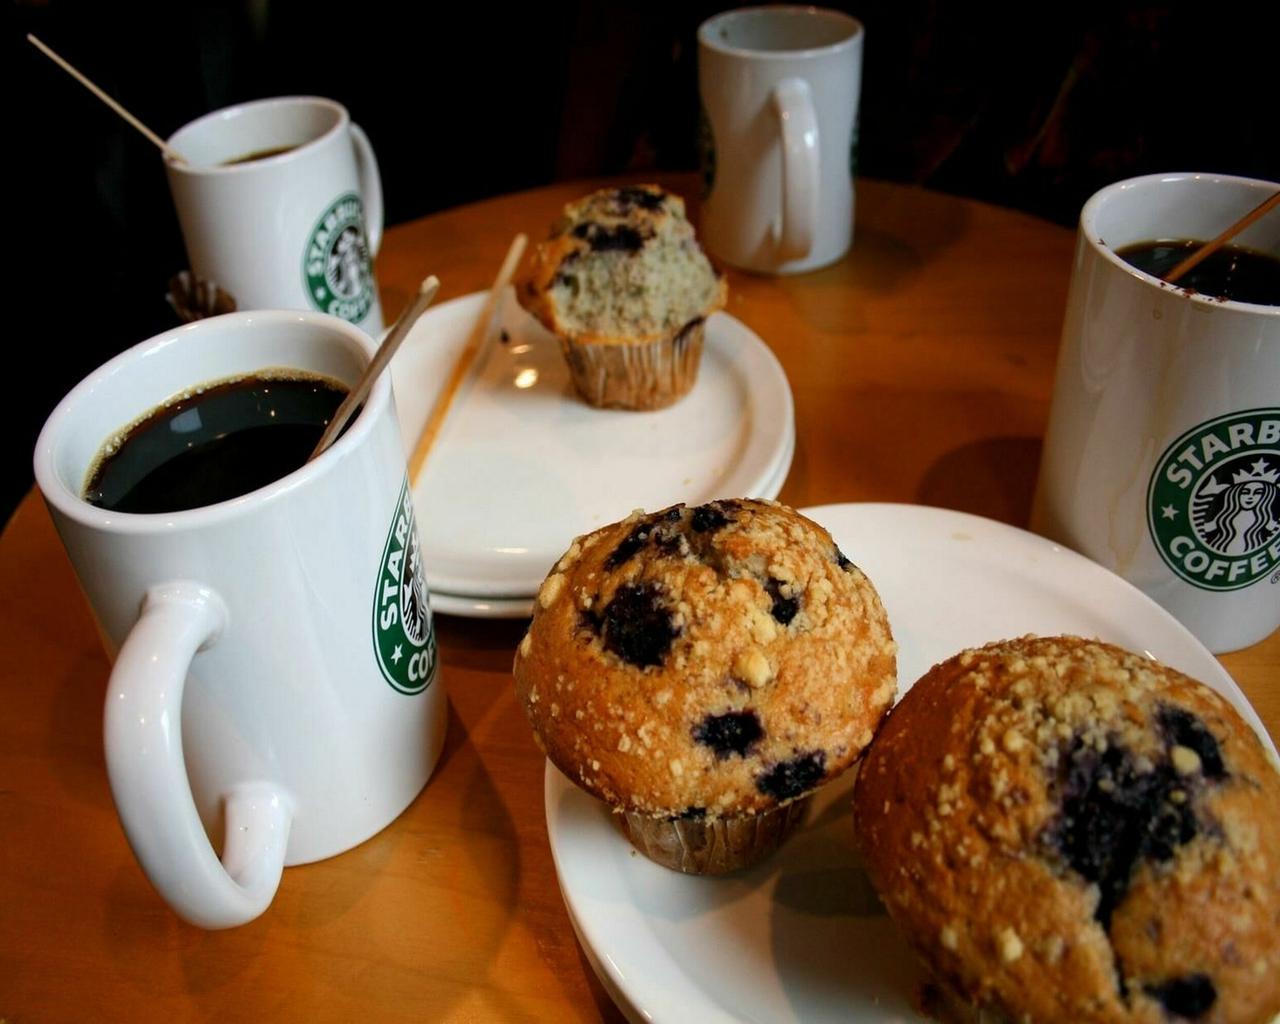 coffee to drink starbucks 25055213 1280 1024 Starbuckscoffee Franchise